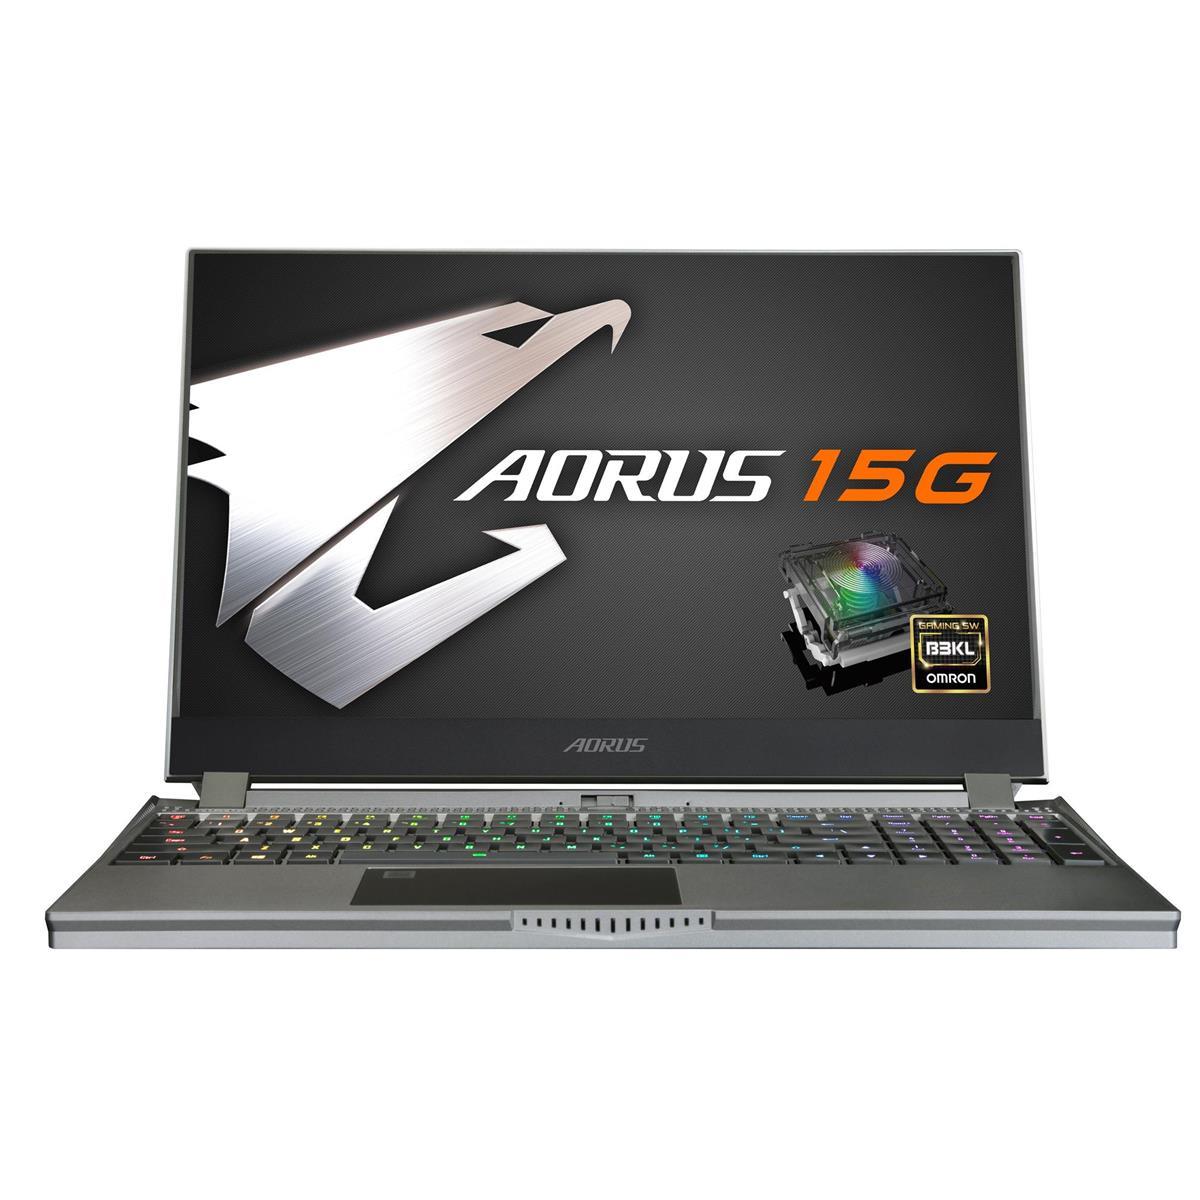 "Gigabyte AORUS 15G 15.6"" Full HD 240Hz Gaming Notebook Computer, Intel Core i7-10875H 2.3GHz, 16GB RAM, 512GB SSD, NVIDIA GeForce RTX 2070 8GB, Windows 10 Home, Black"